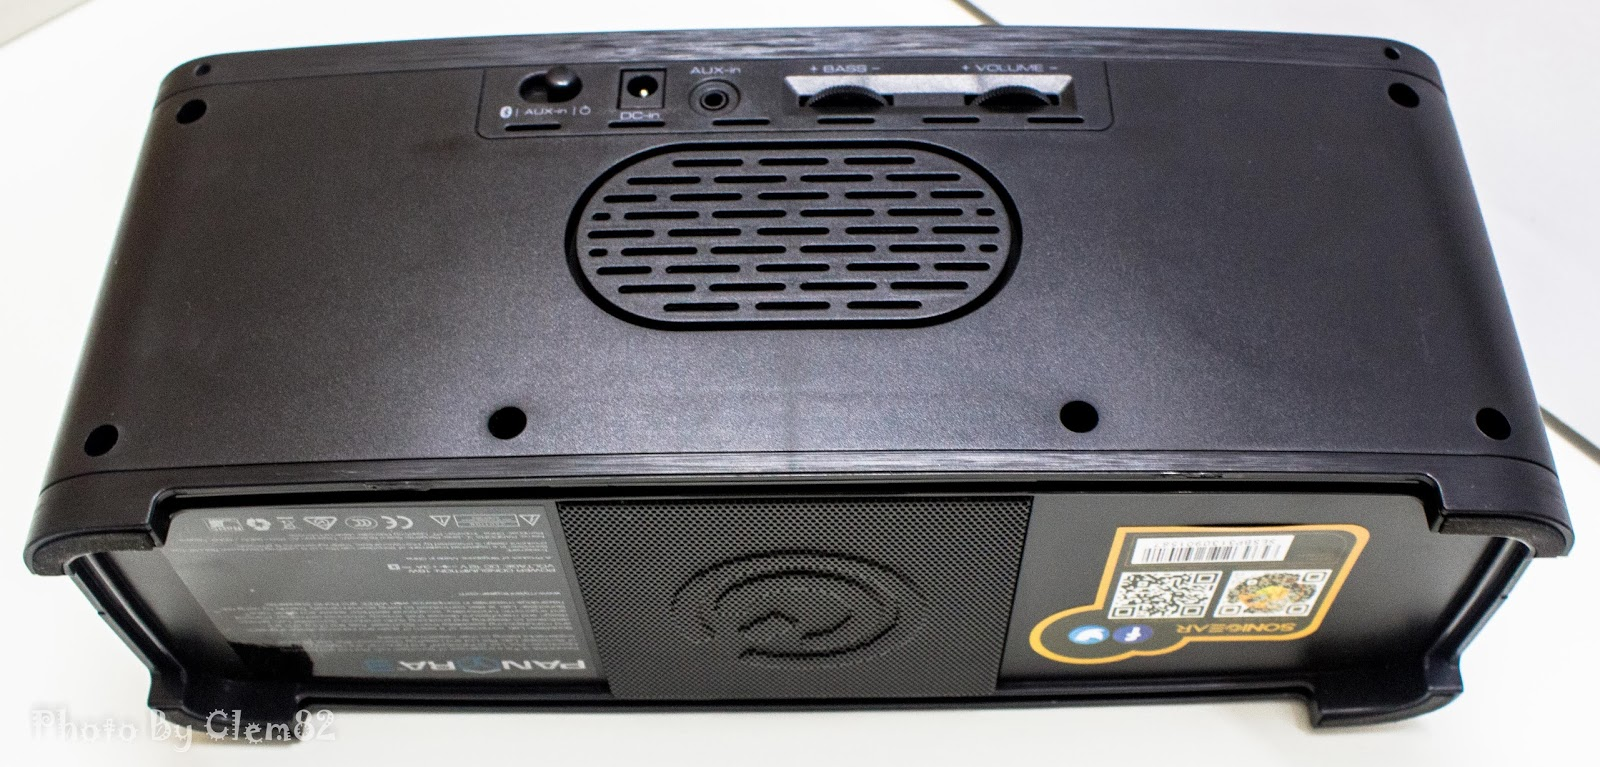 Opening Pandora's Box: SonicGear Pandora Wireless Bluetooth Media Player Series 24